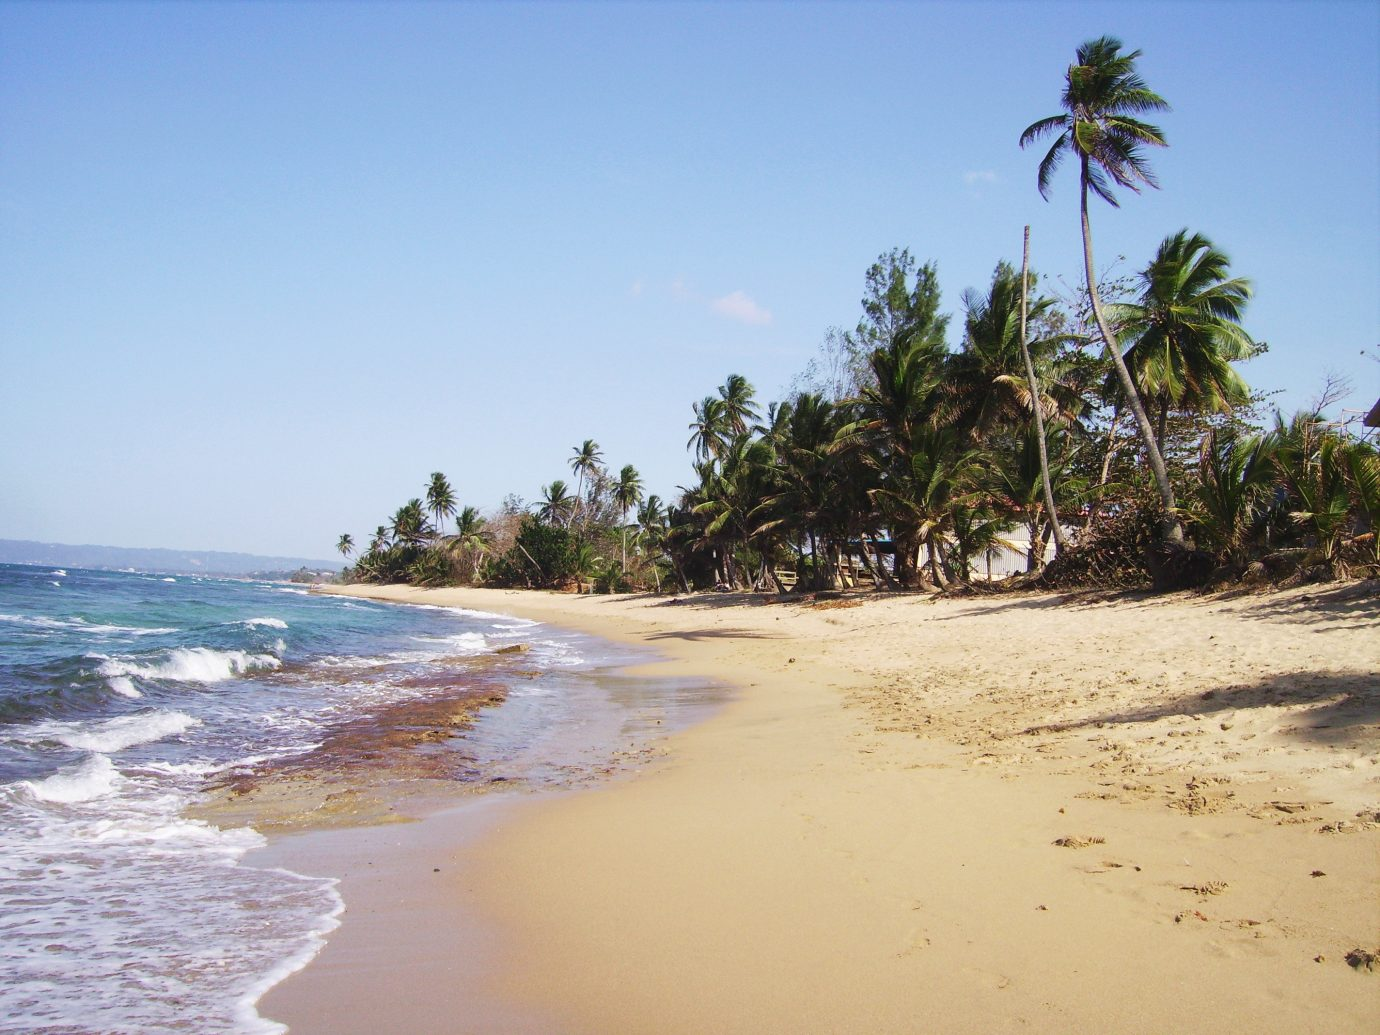 Spanish Wall Beach in Rincon, Puerto Rico